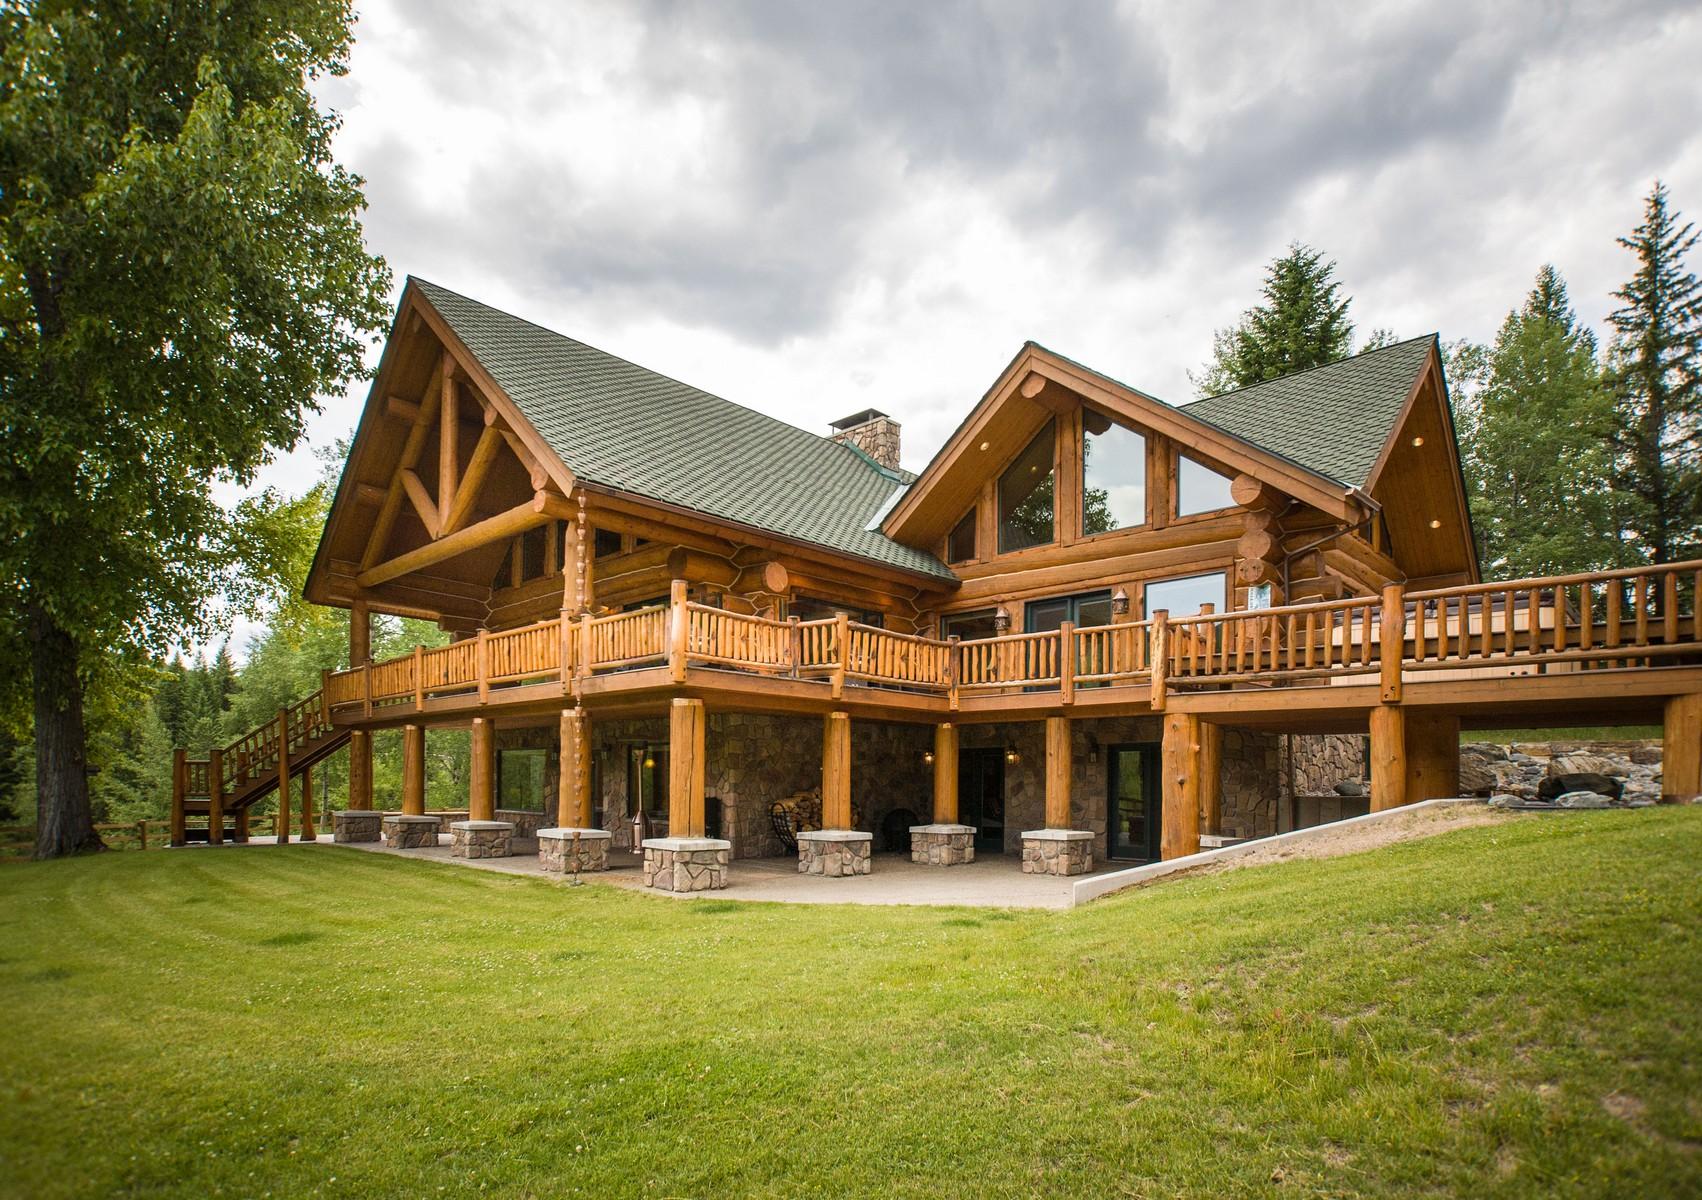 Single Family Home for Sale at Ten Lakes Nhn Eureka, Montana, 59917 United States